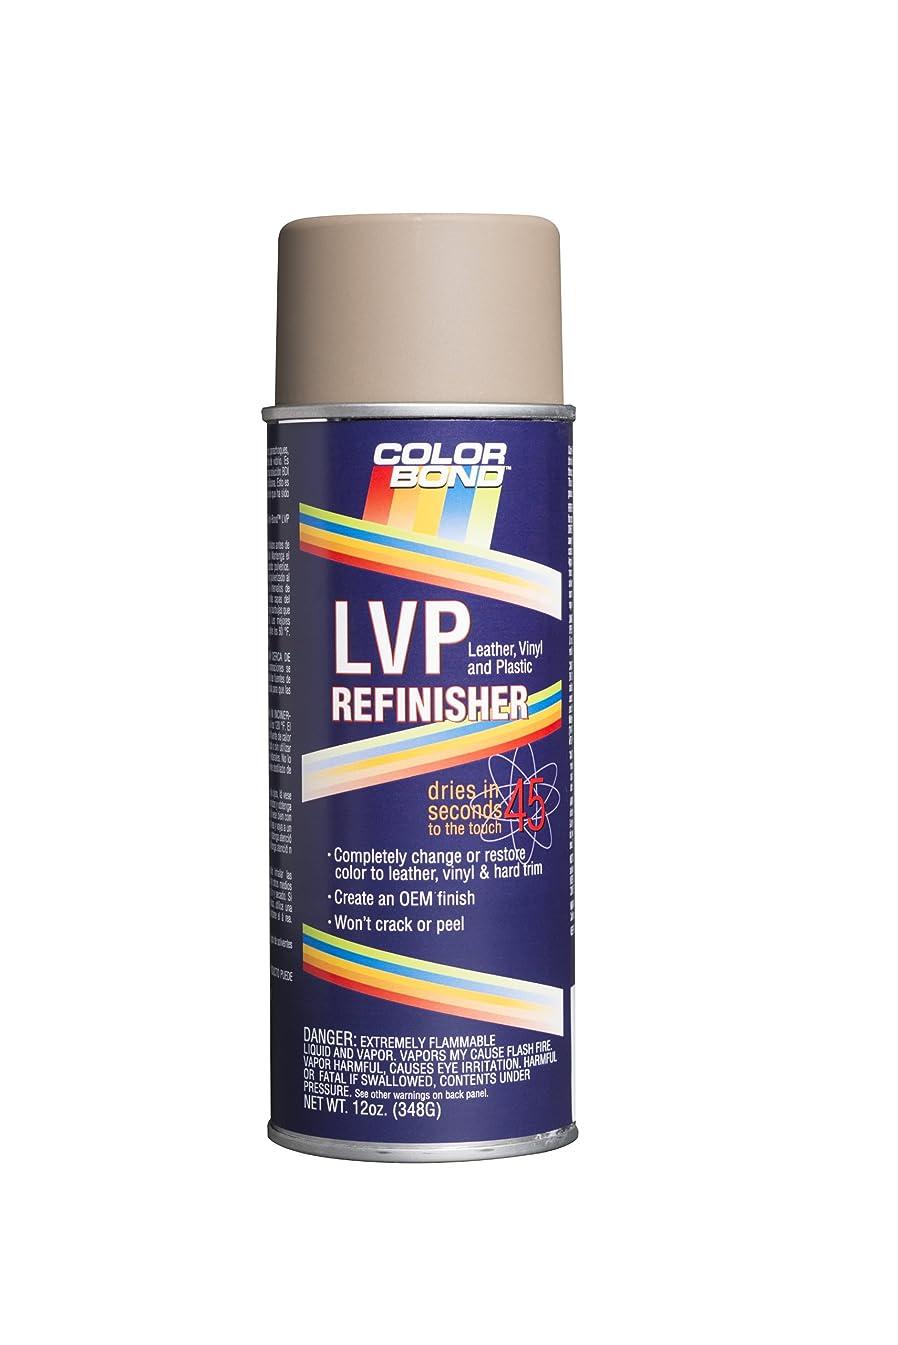 ColorBond (162) Chrysler Taupe LVP Leather, Vinyl & Hard Plastic Refinisher Spray Paint - 12 oz.